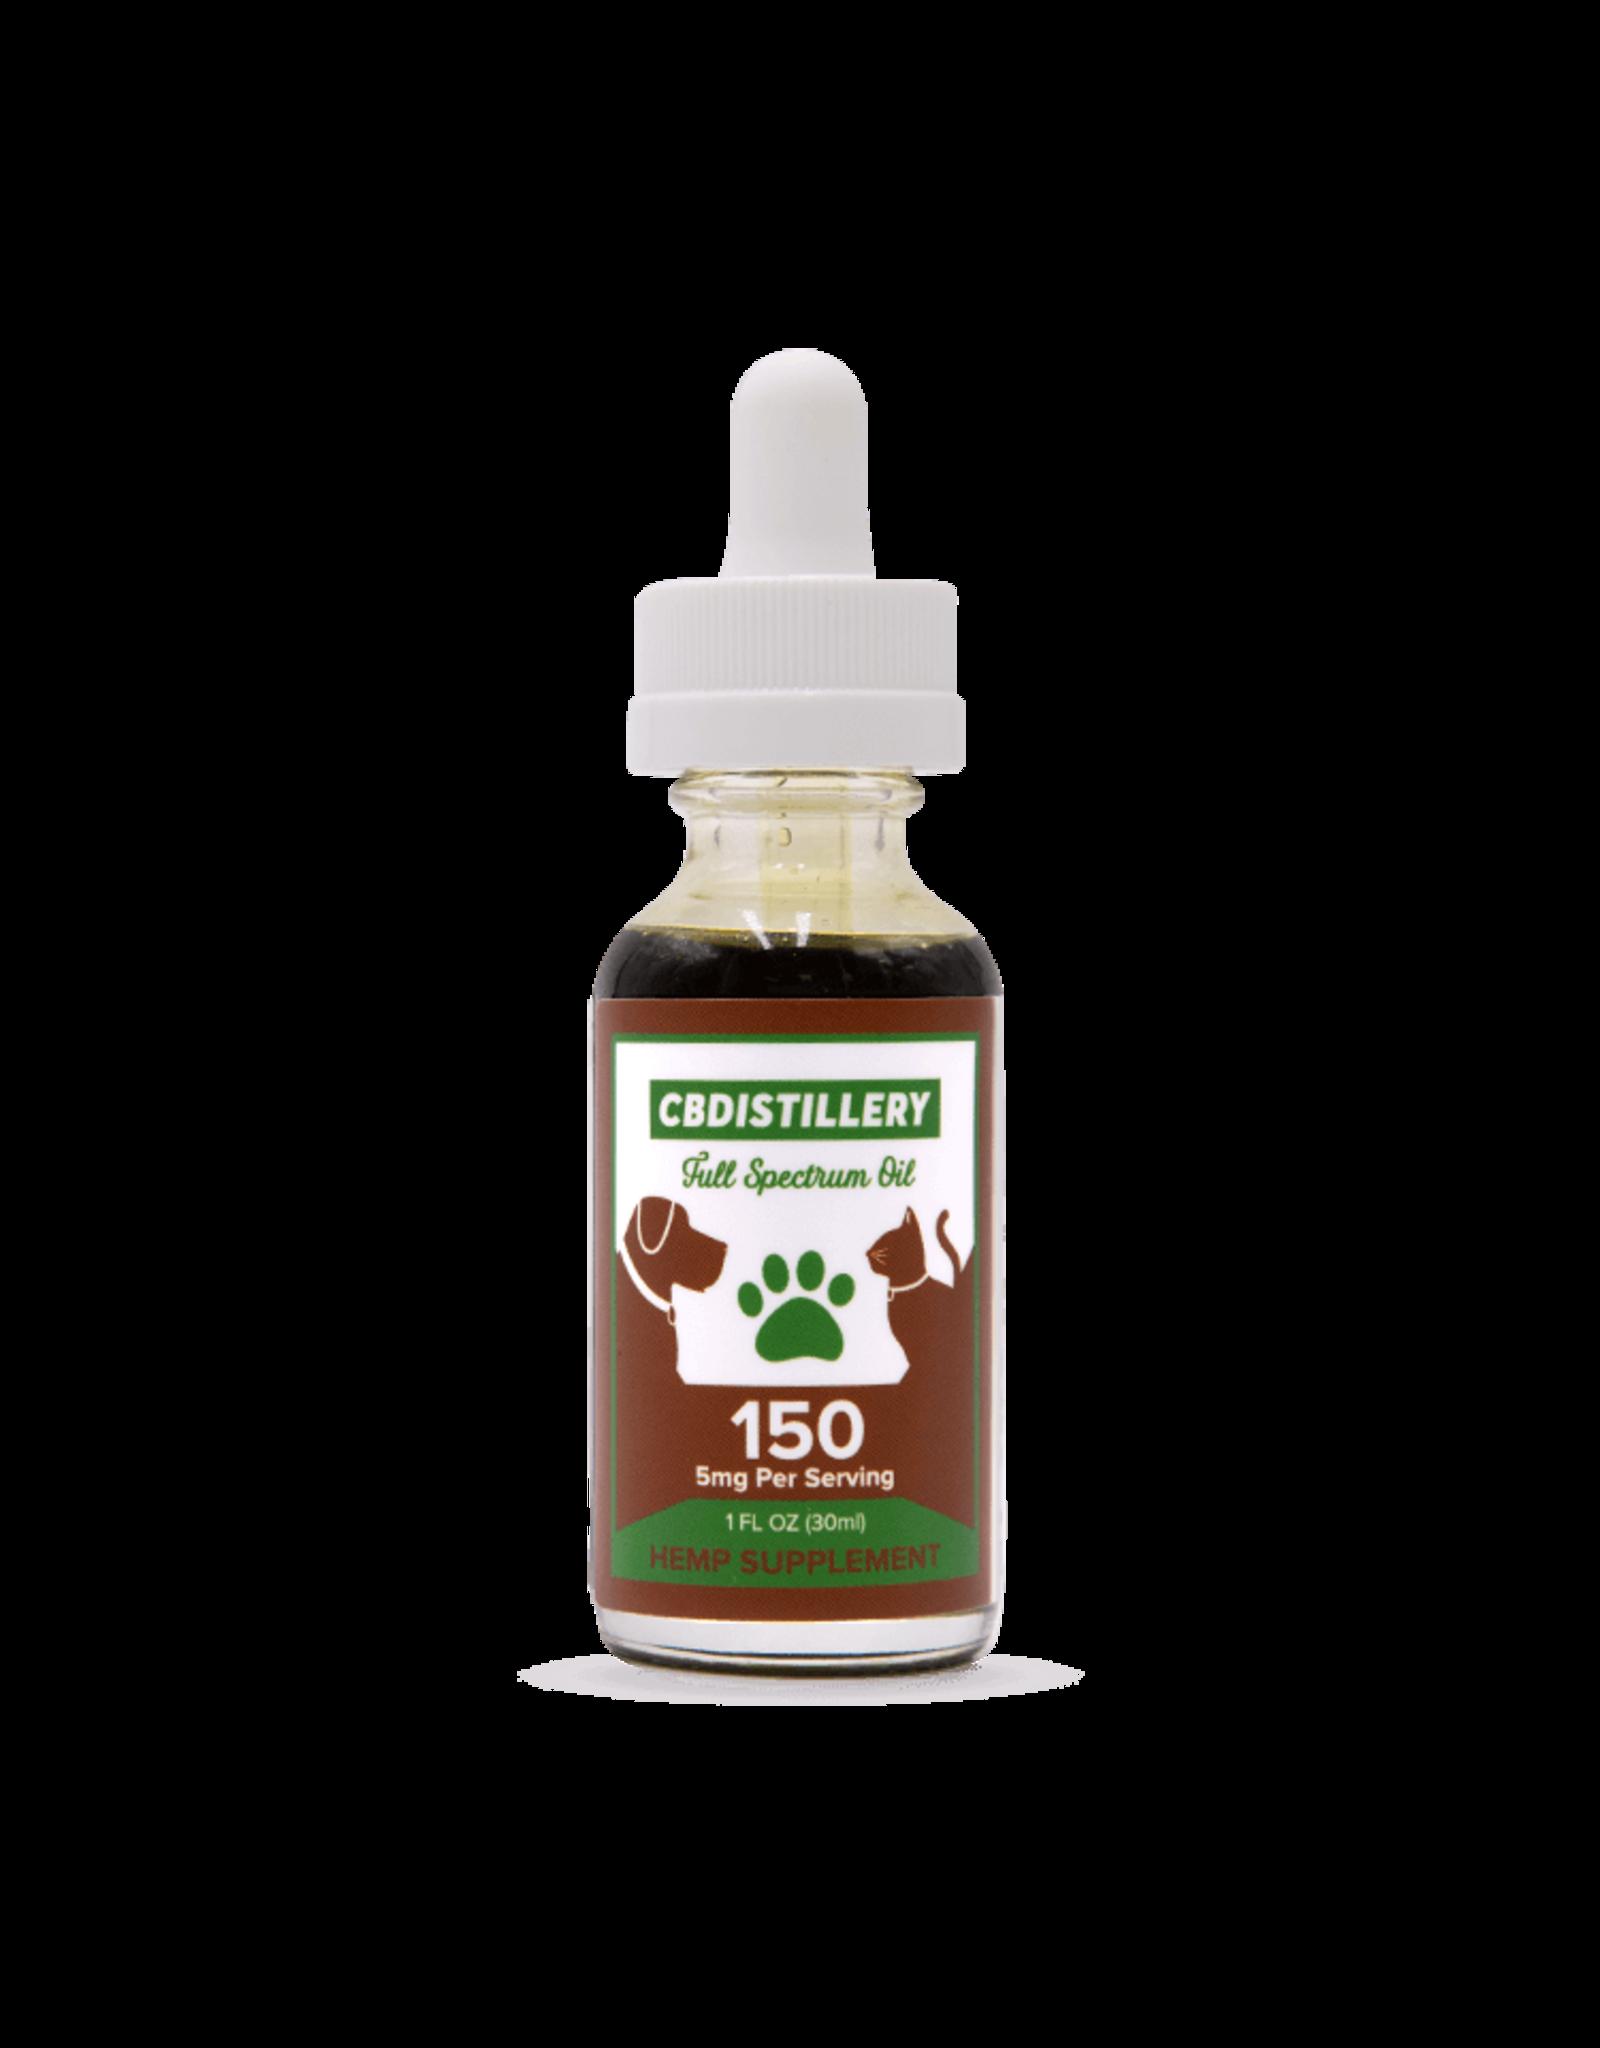 CBDistillery CBDistillery 5 mg Per Serving 30 ml Full Spectrum Pet Tincture